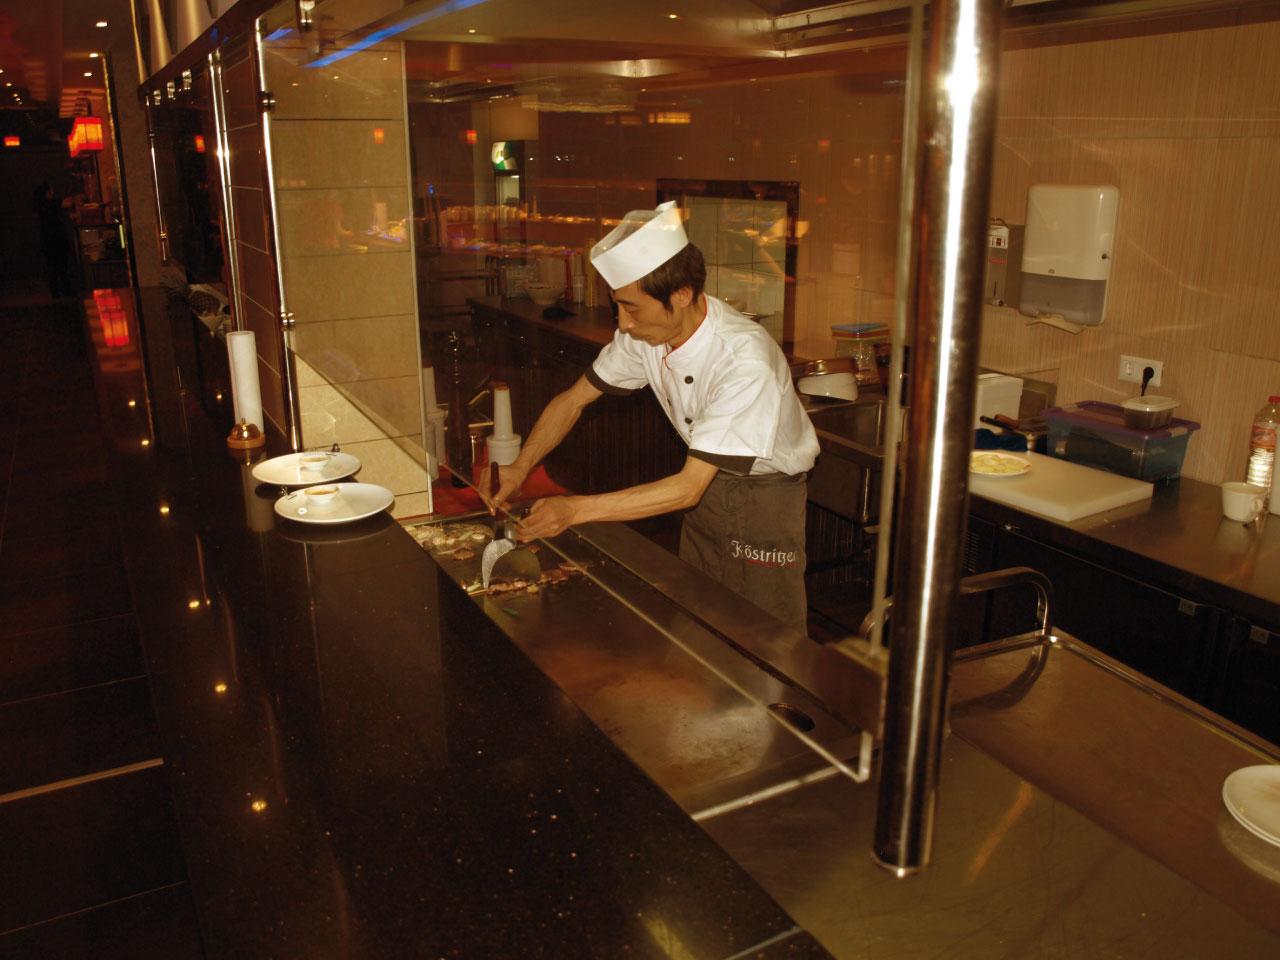 hyl_images_1280x960_restaurant_1